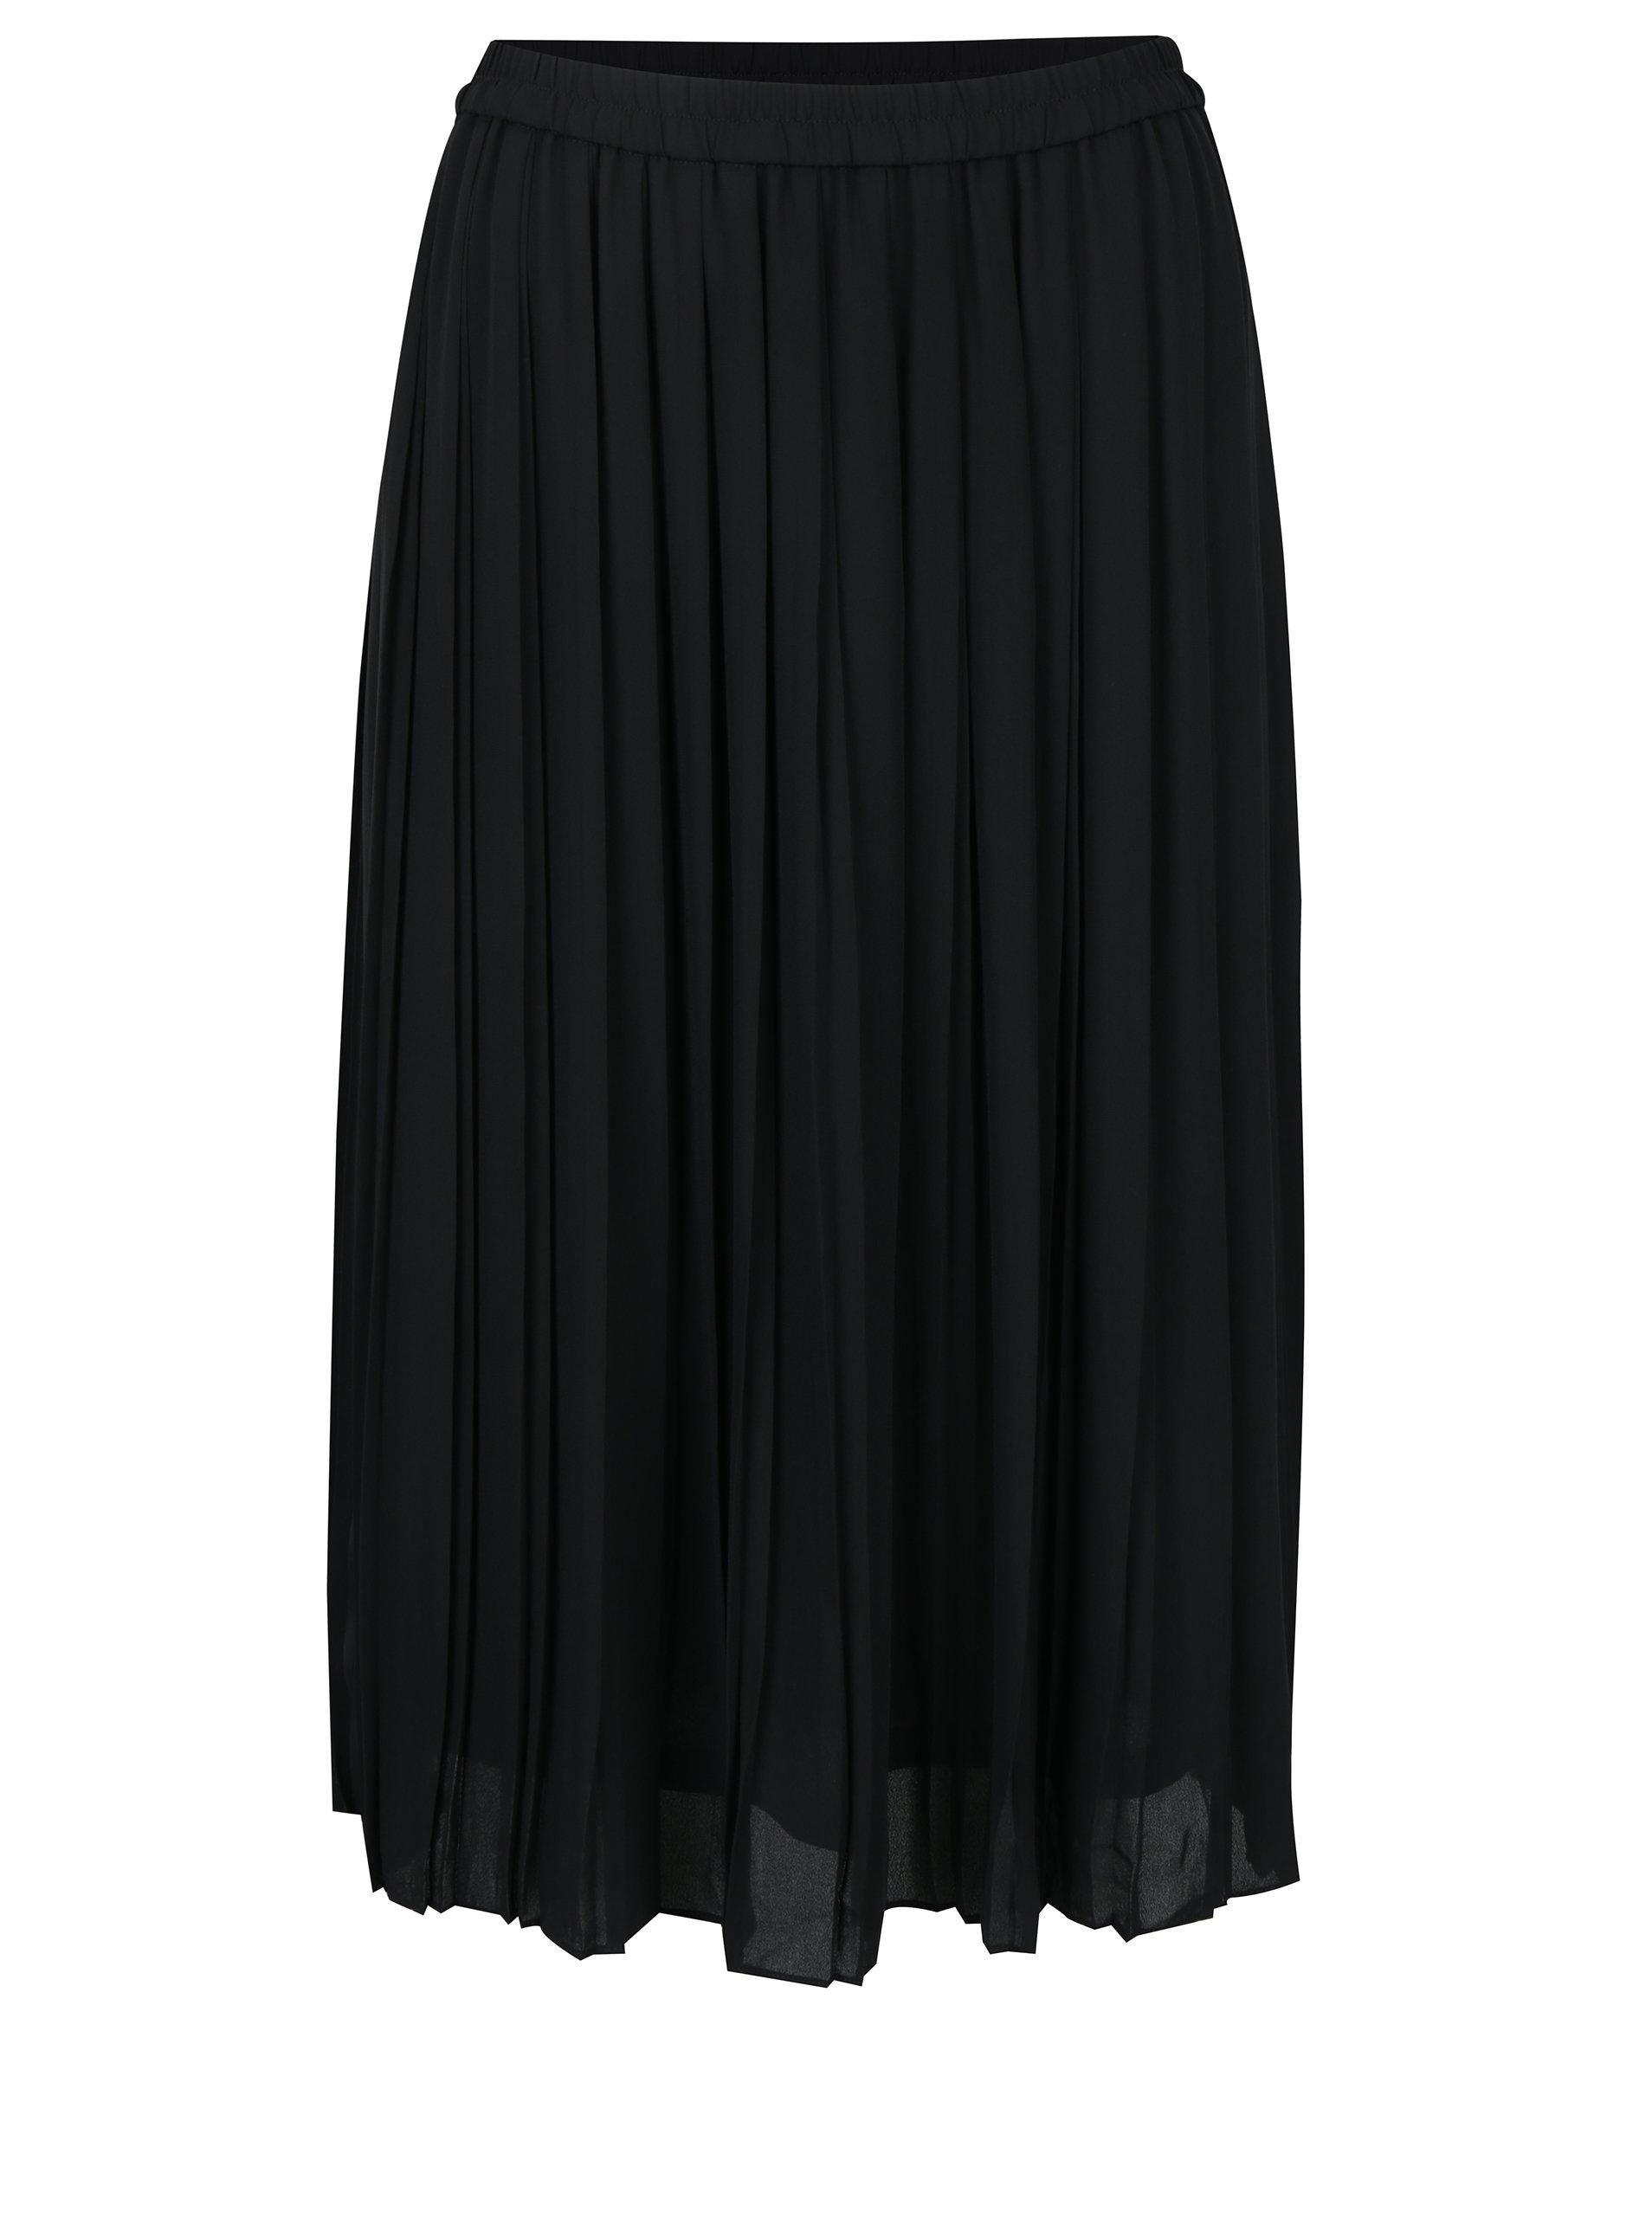 Černá plisovaná midi sukně VERO MODA Swing